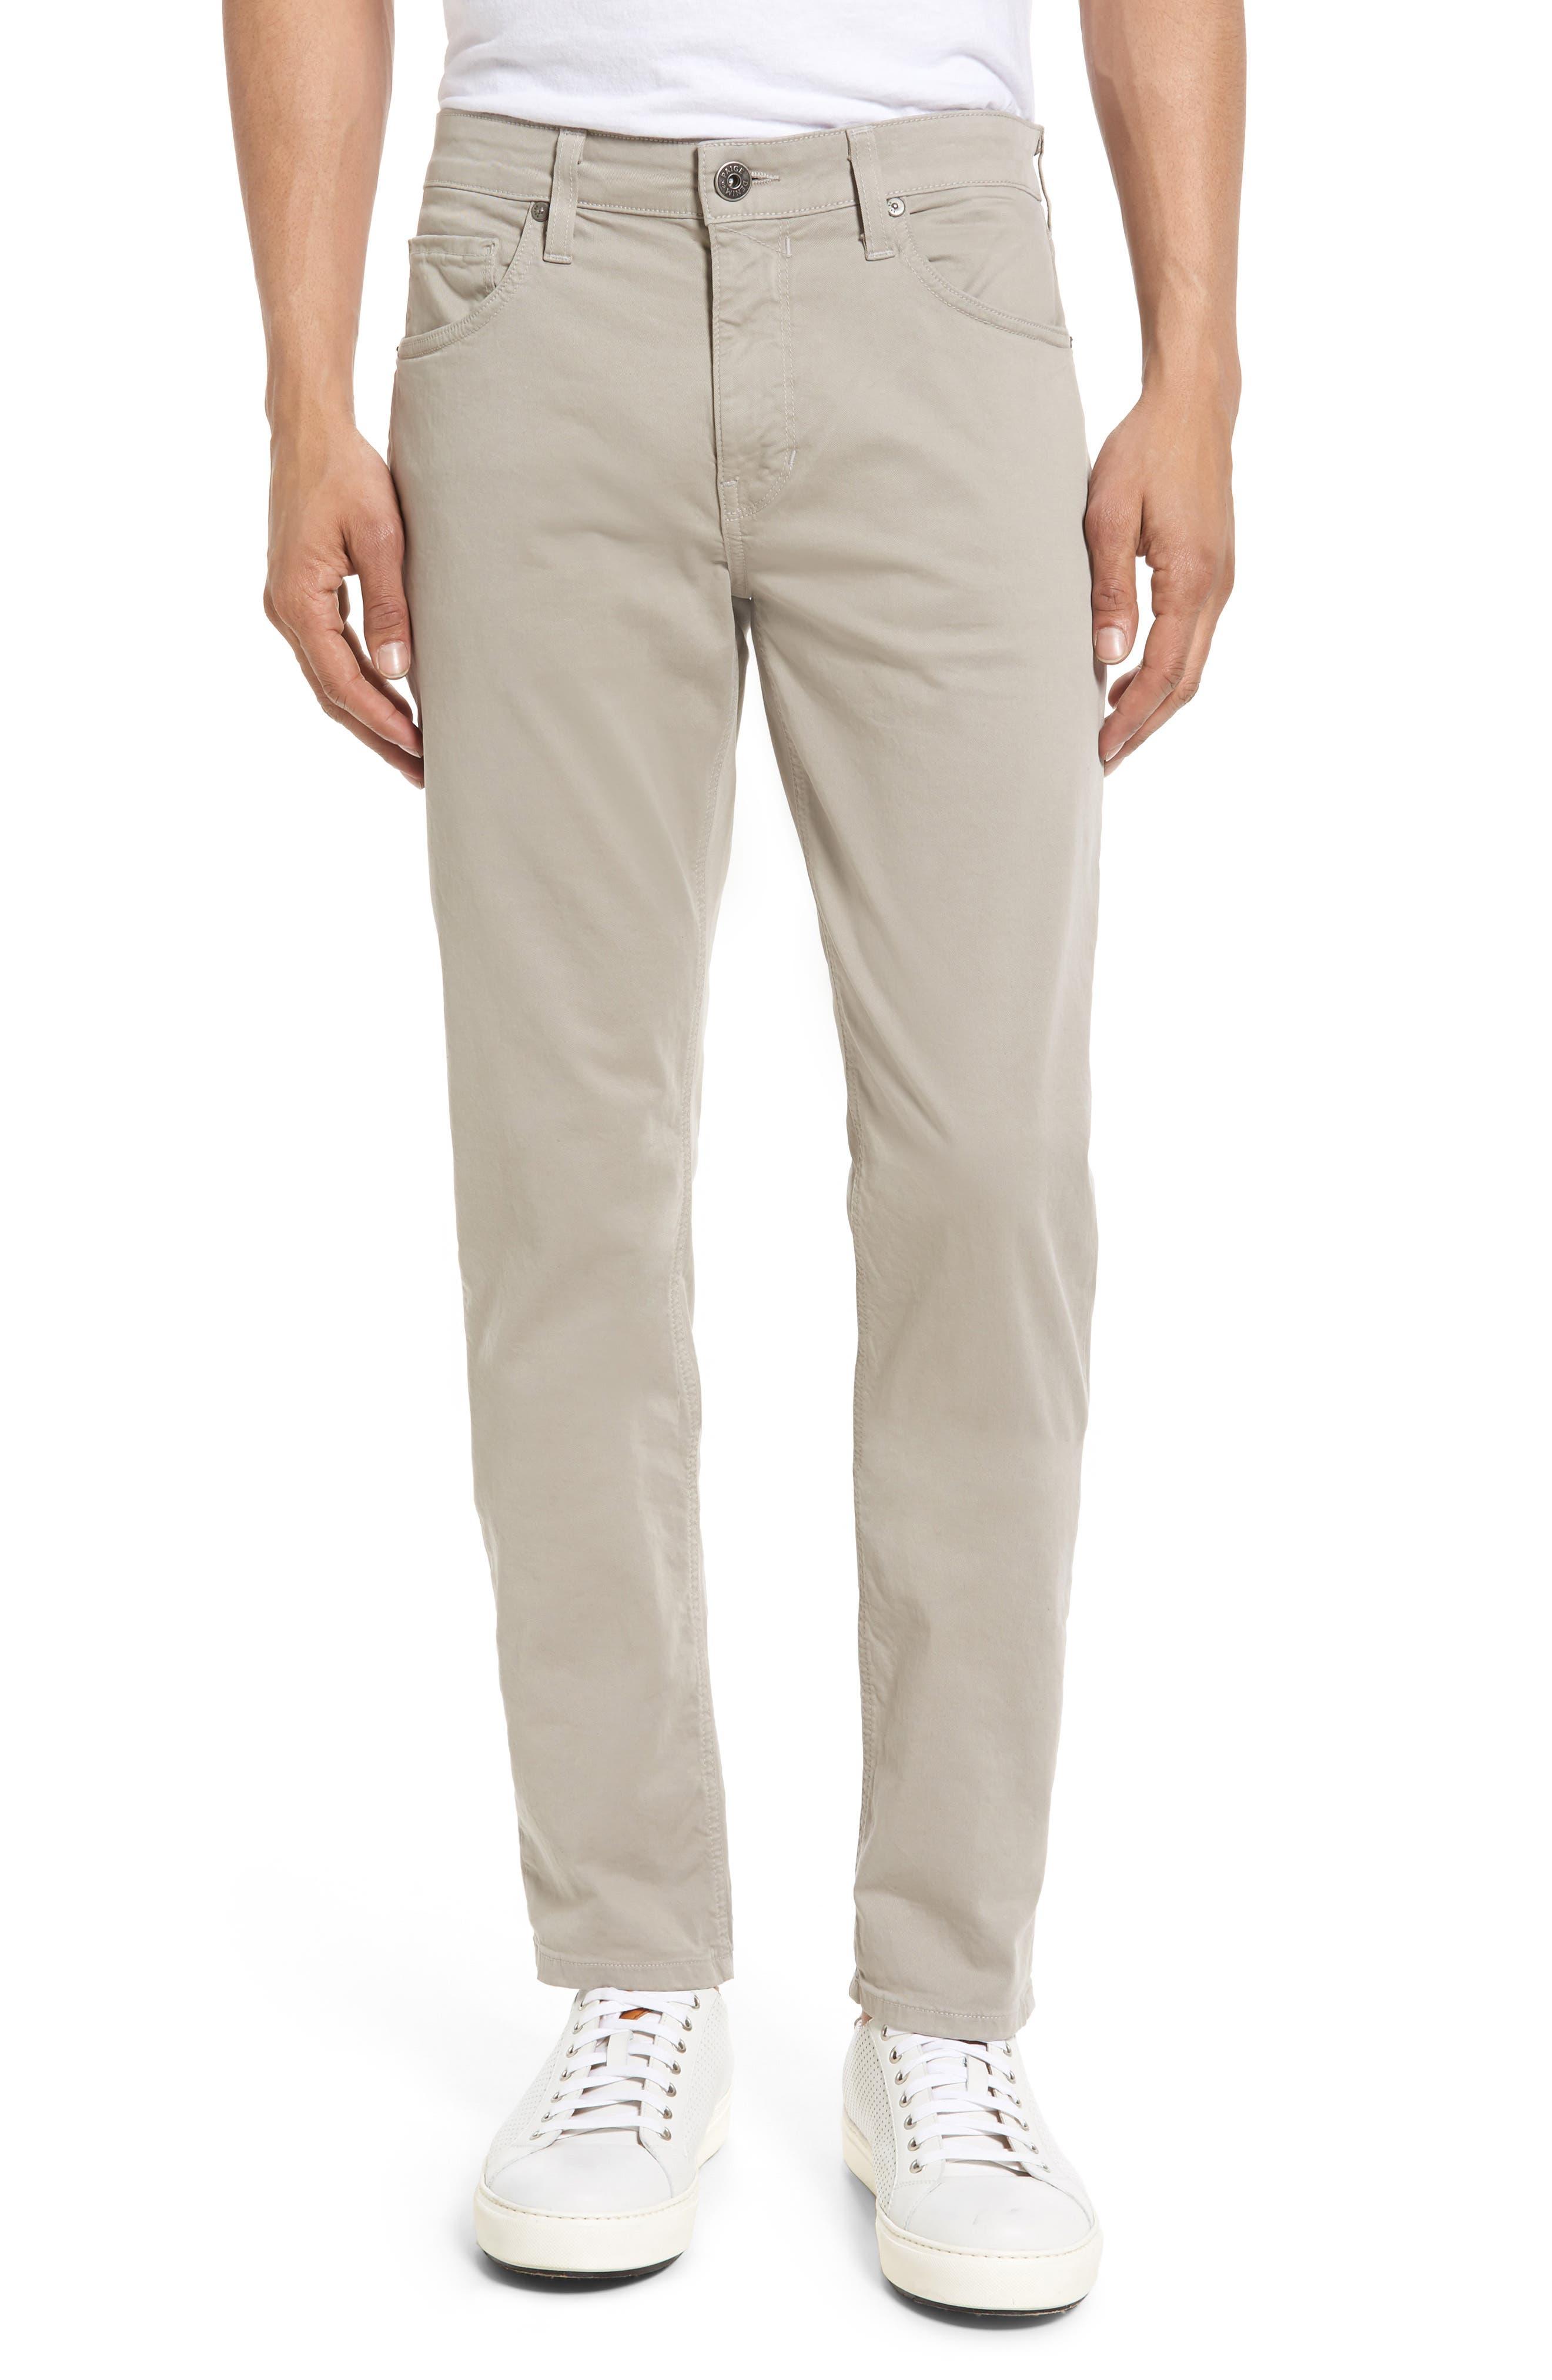 Lennox Skinny Fit Pants,                         Main,                         color, Grey Coast